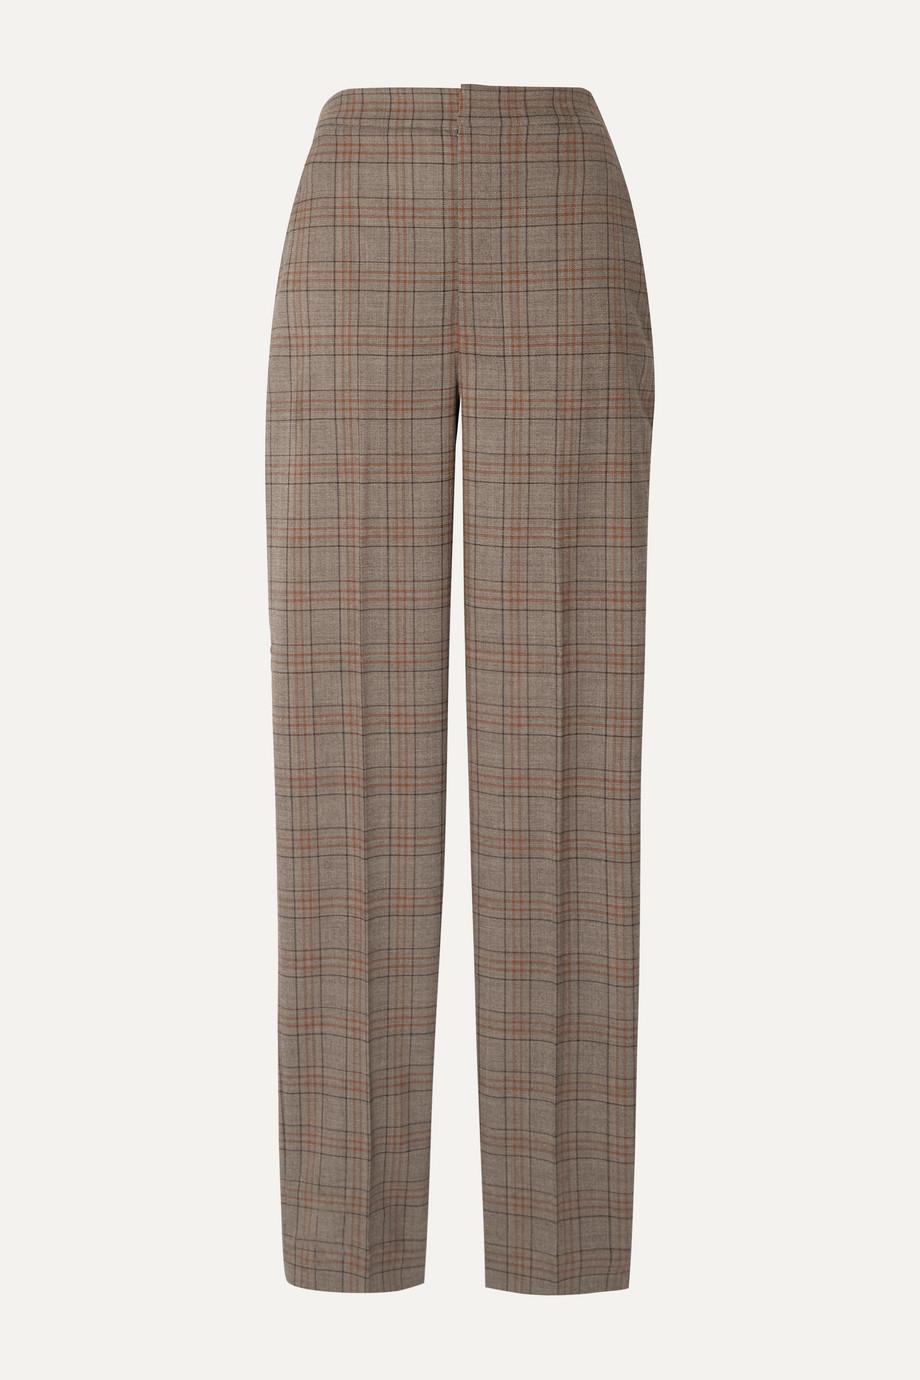 Tibi Sebastian checked woven straight-leg pants